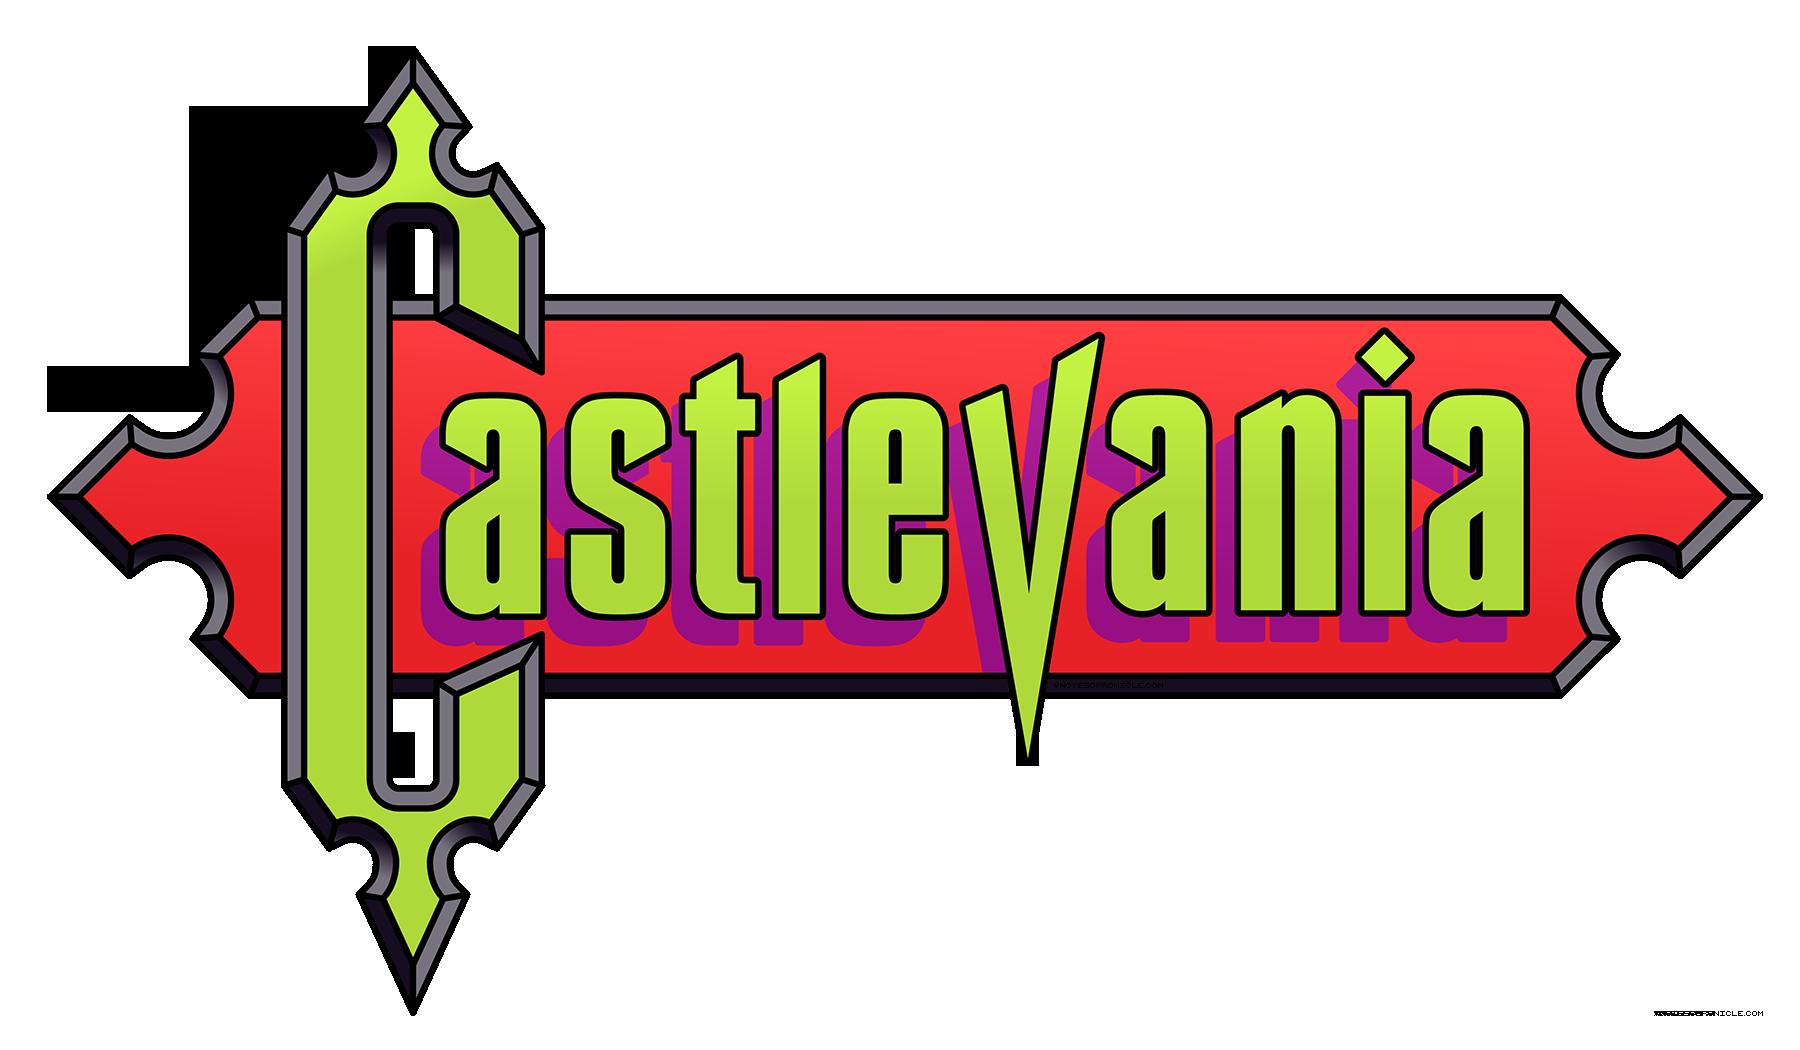 Castlevania (universe)